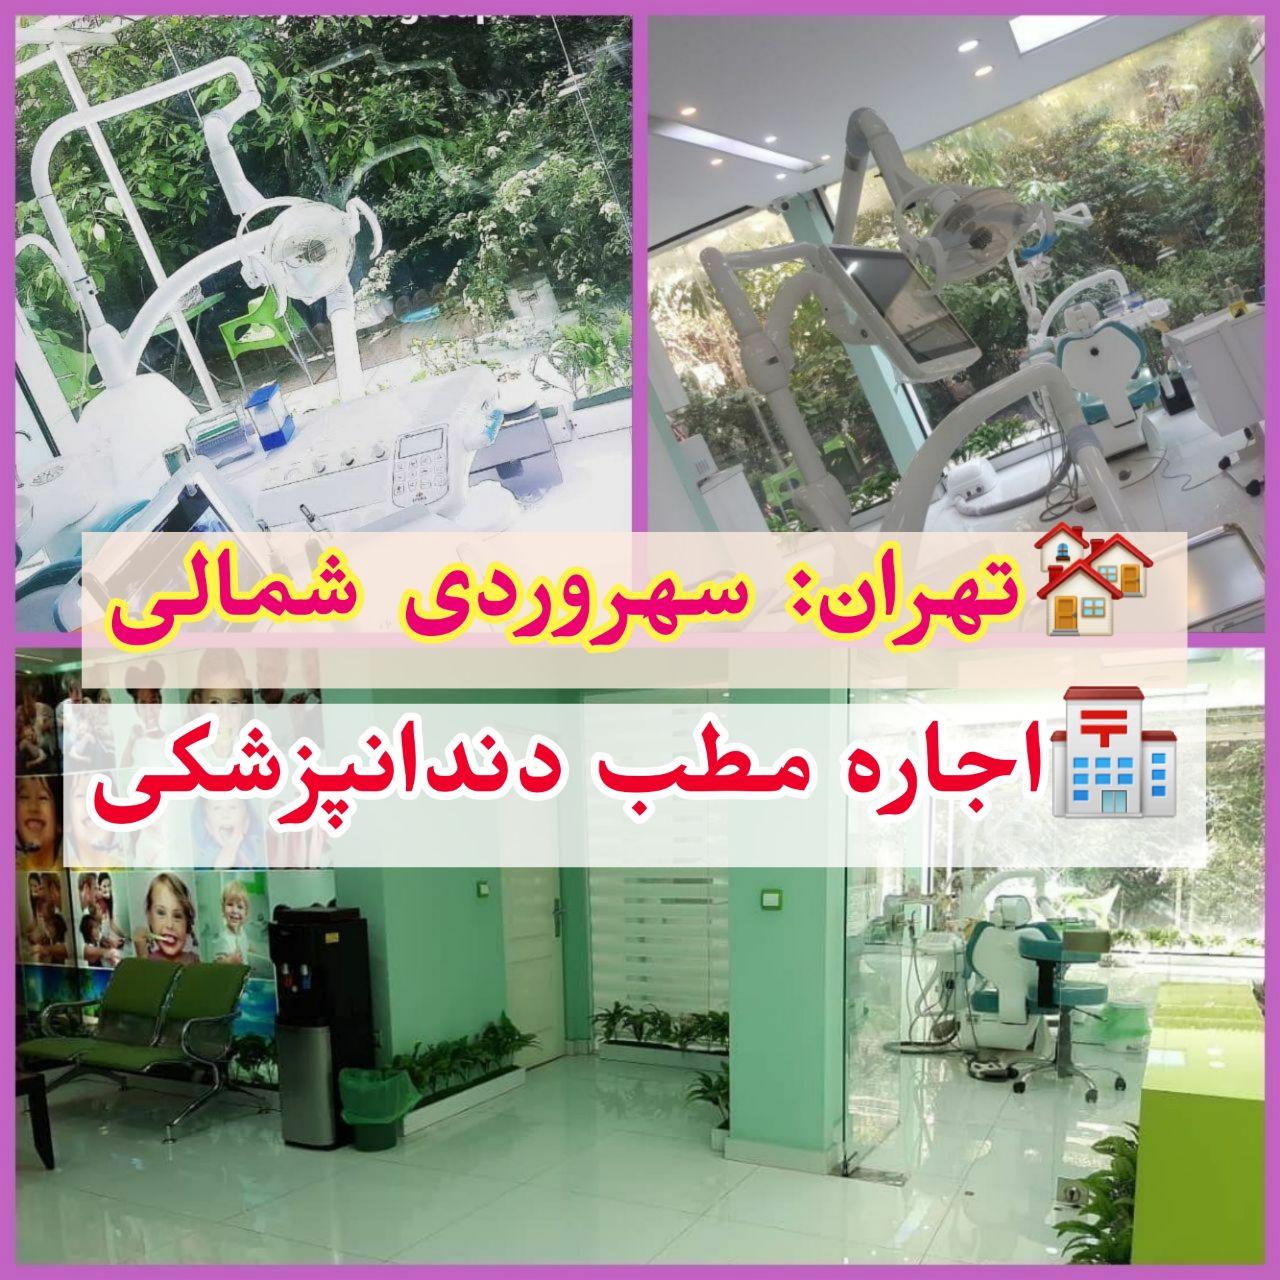 تهران: سهروردی شمالی